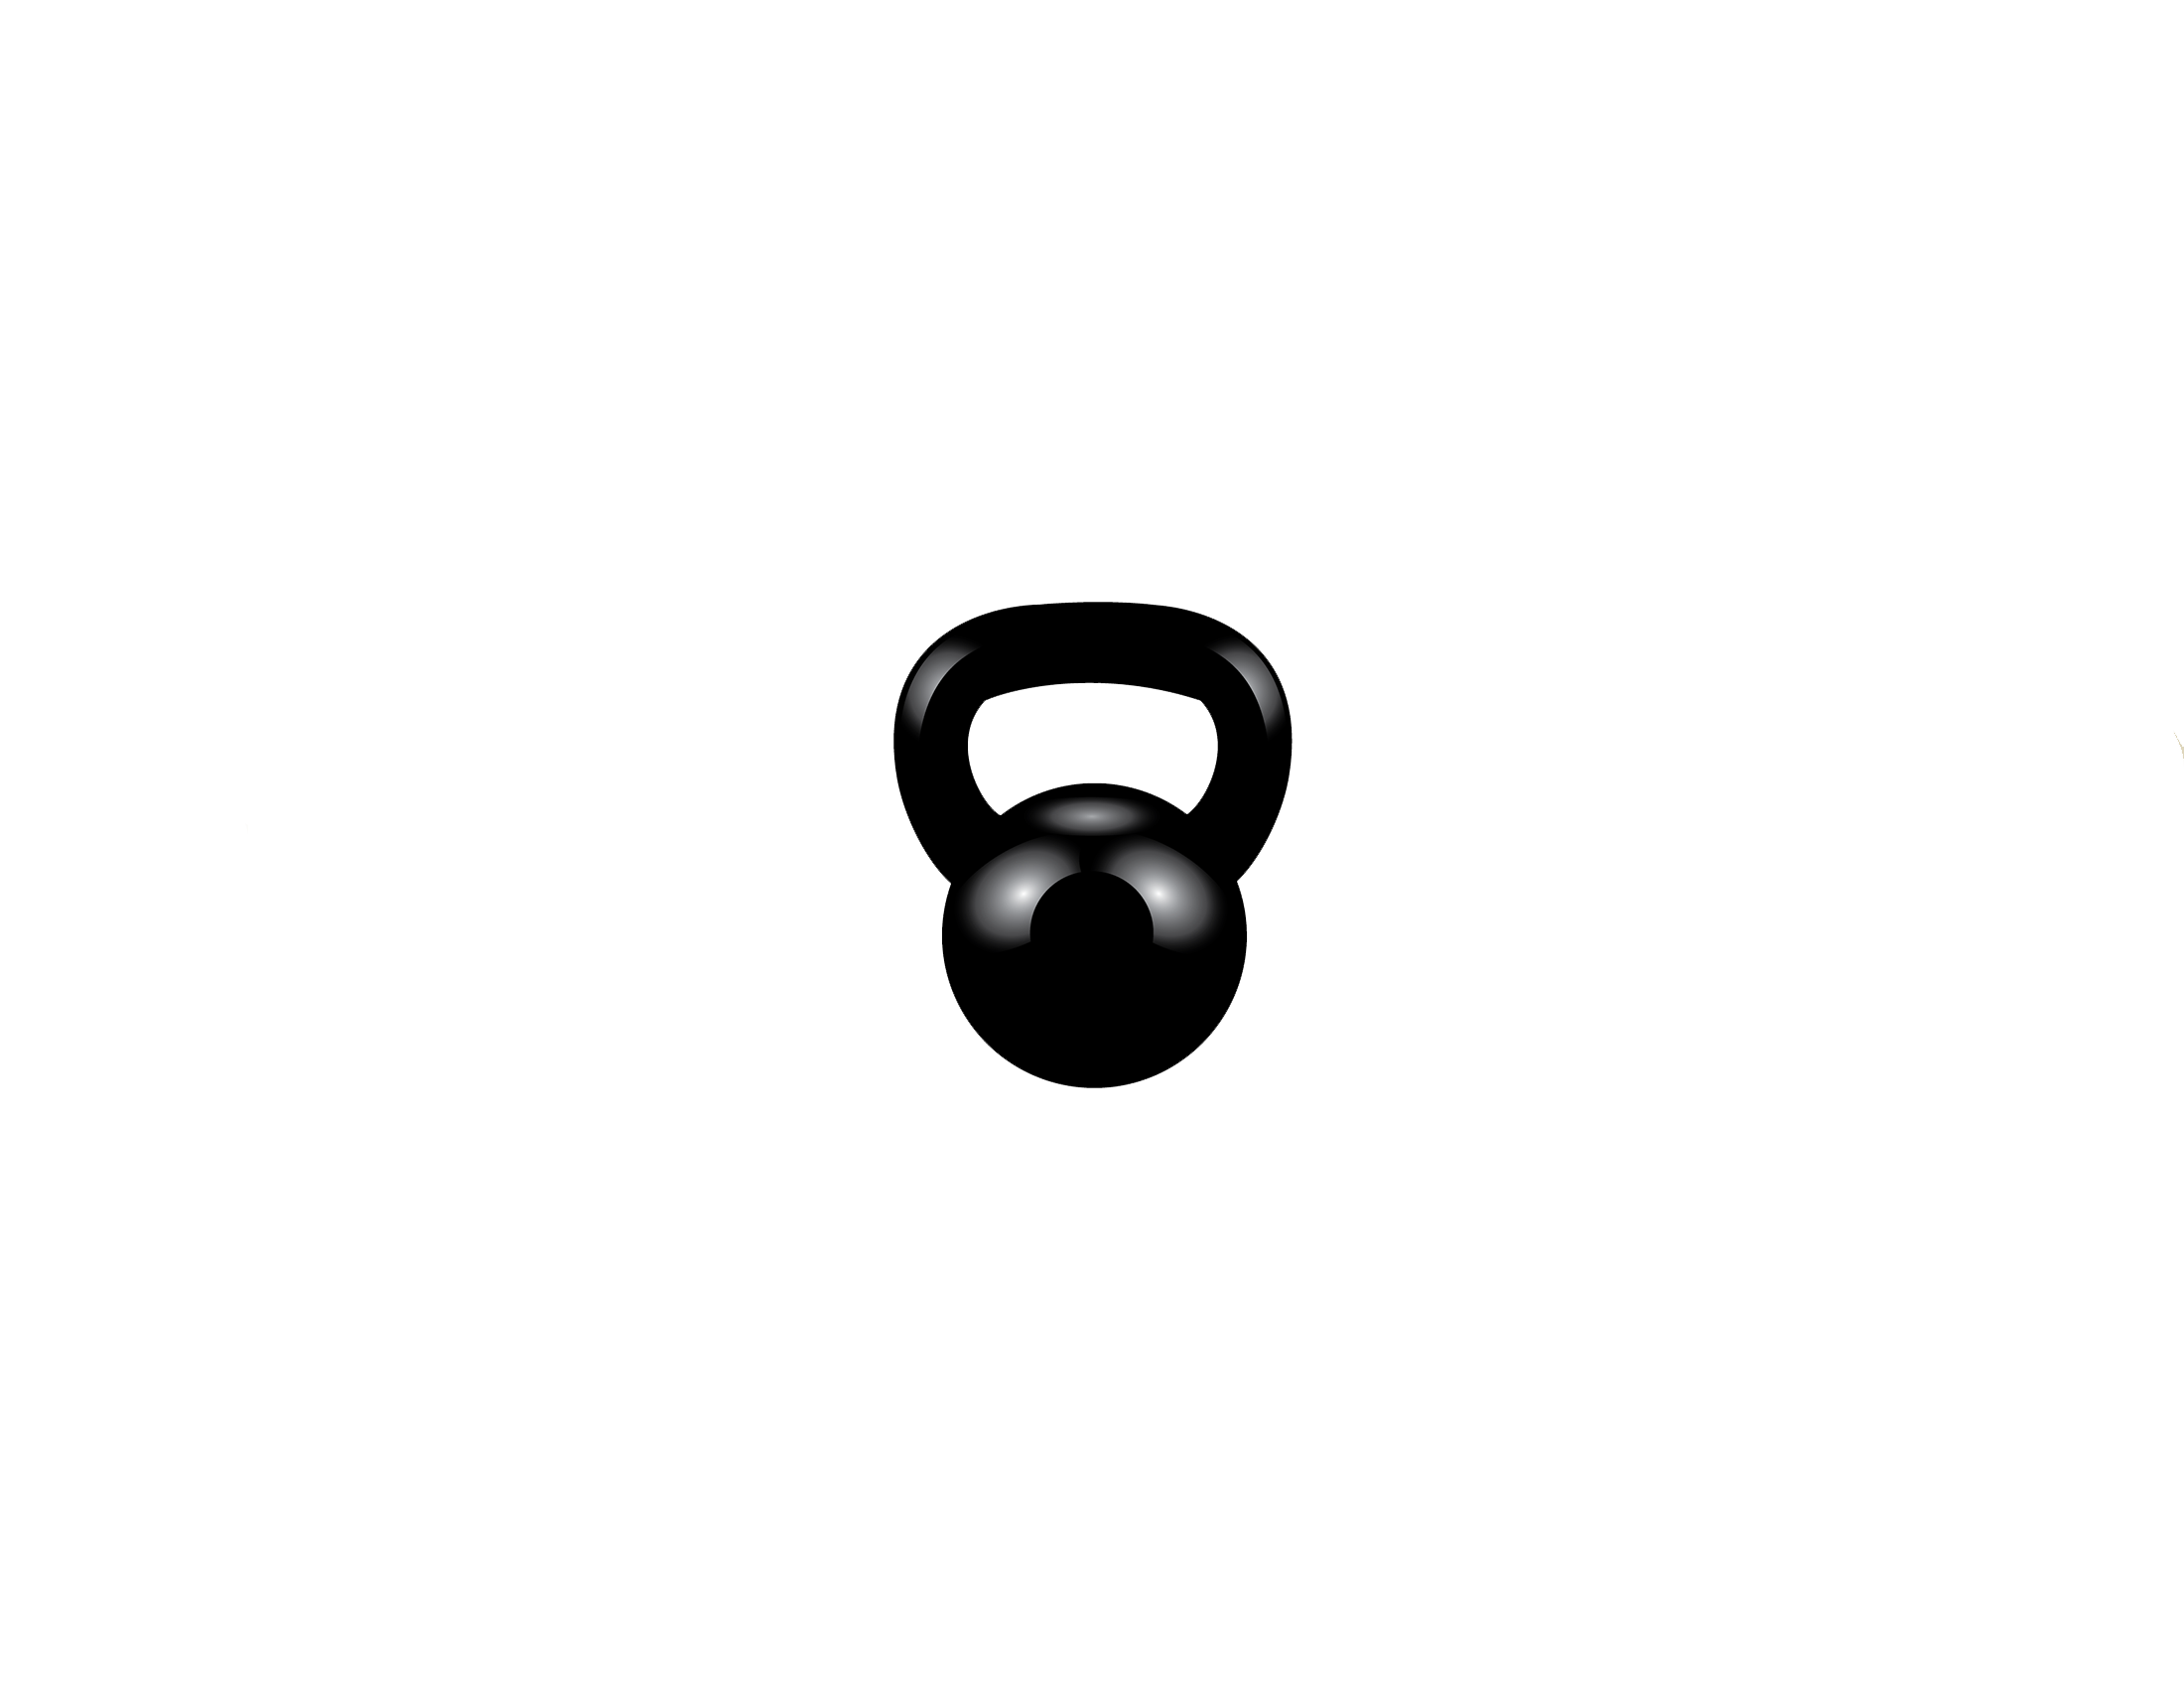 jpg black and white download Lhbc amrap longhorn bbarbell. Crossfit kettlebell clipart